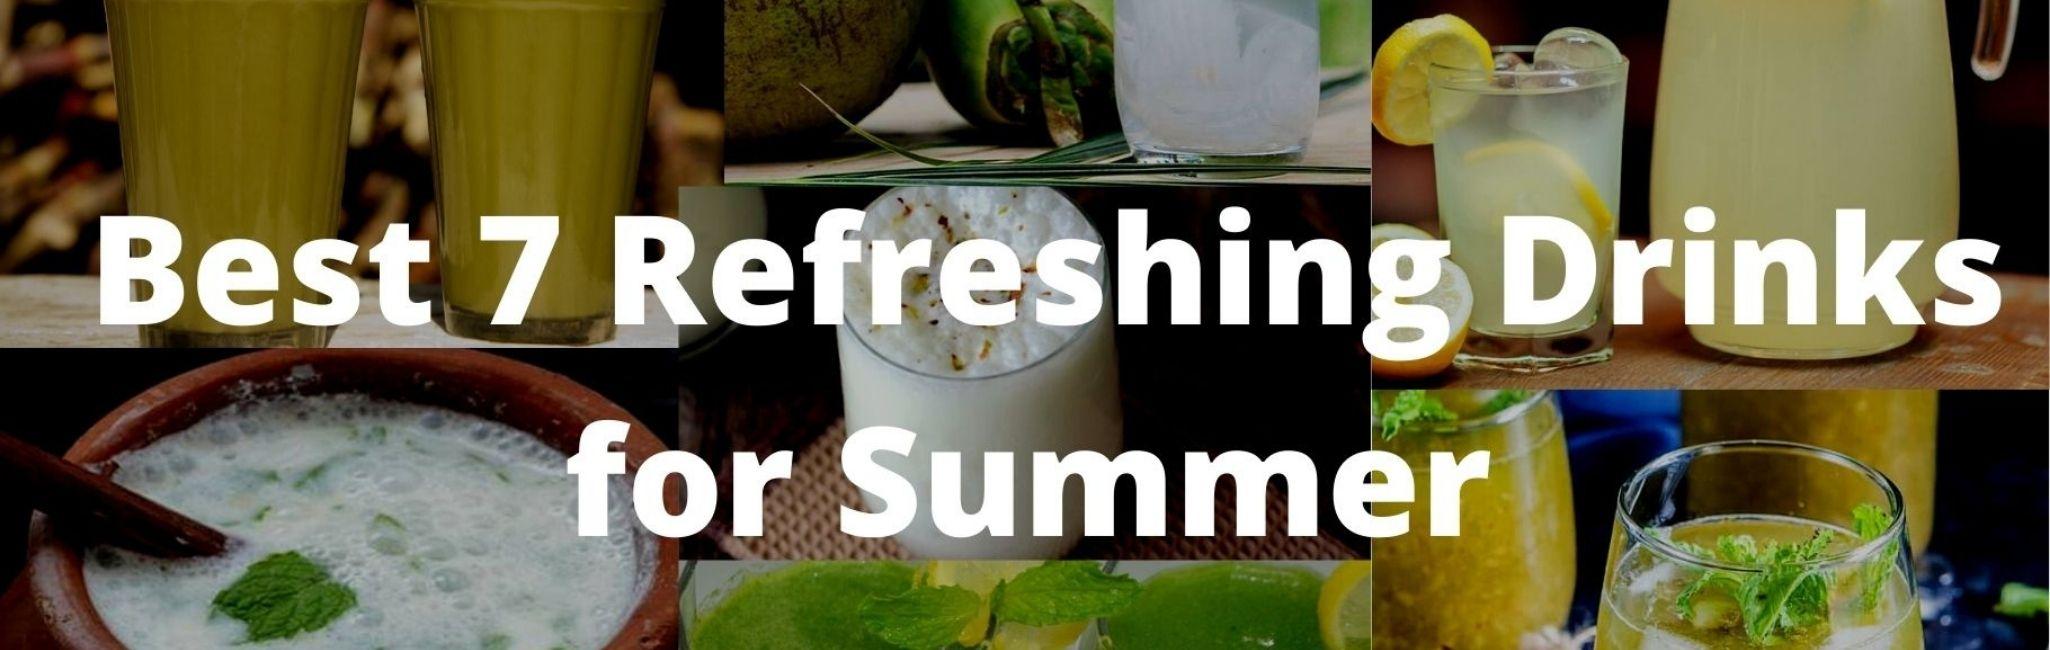 Best 7 Refreshing Drinks for Summer to Beat the Heatstroke